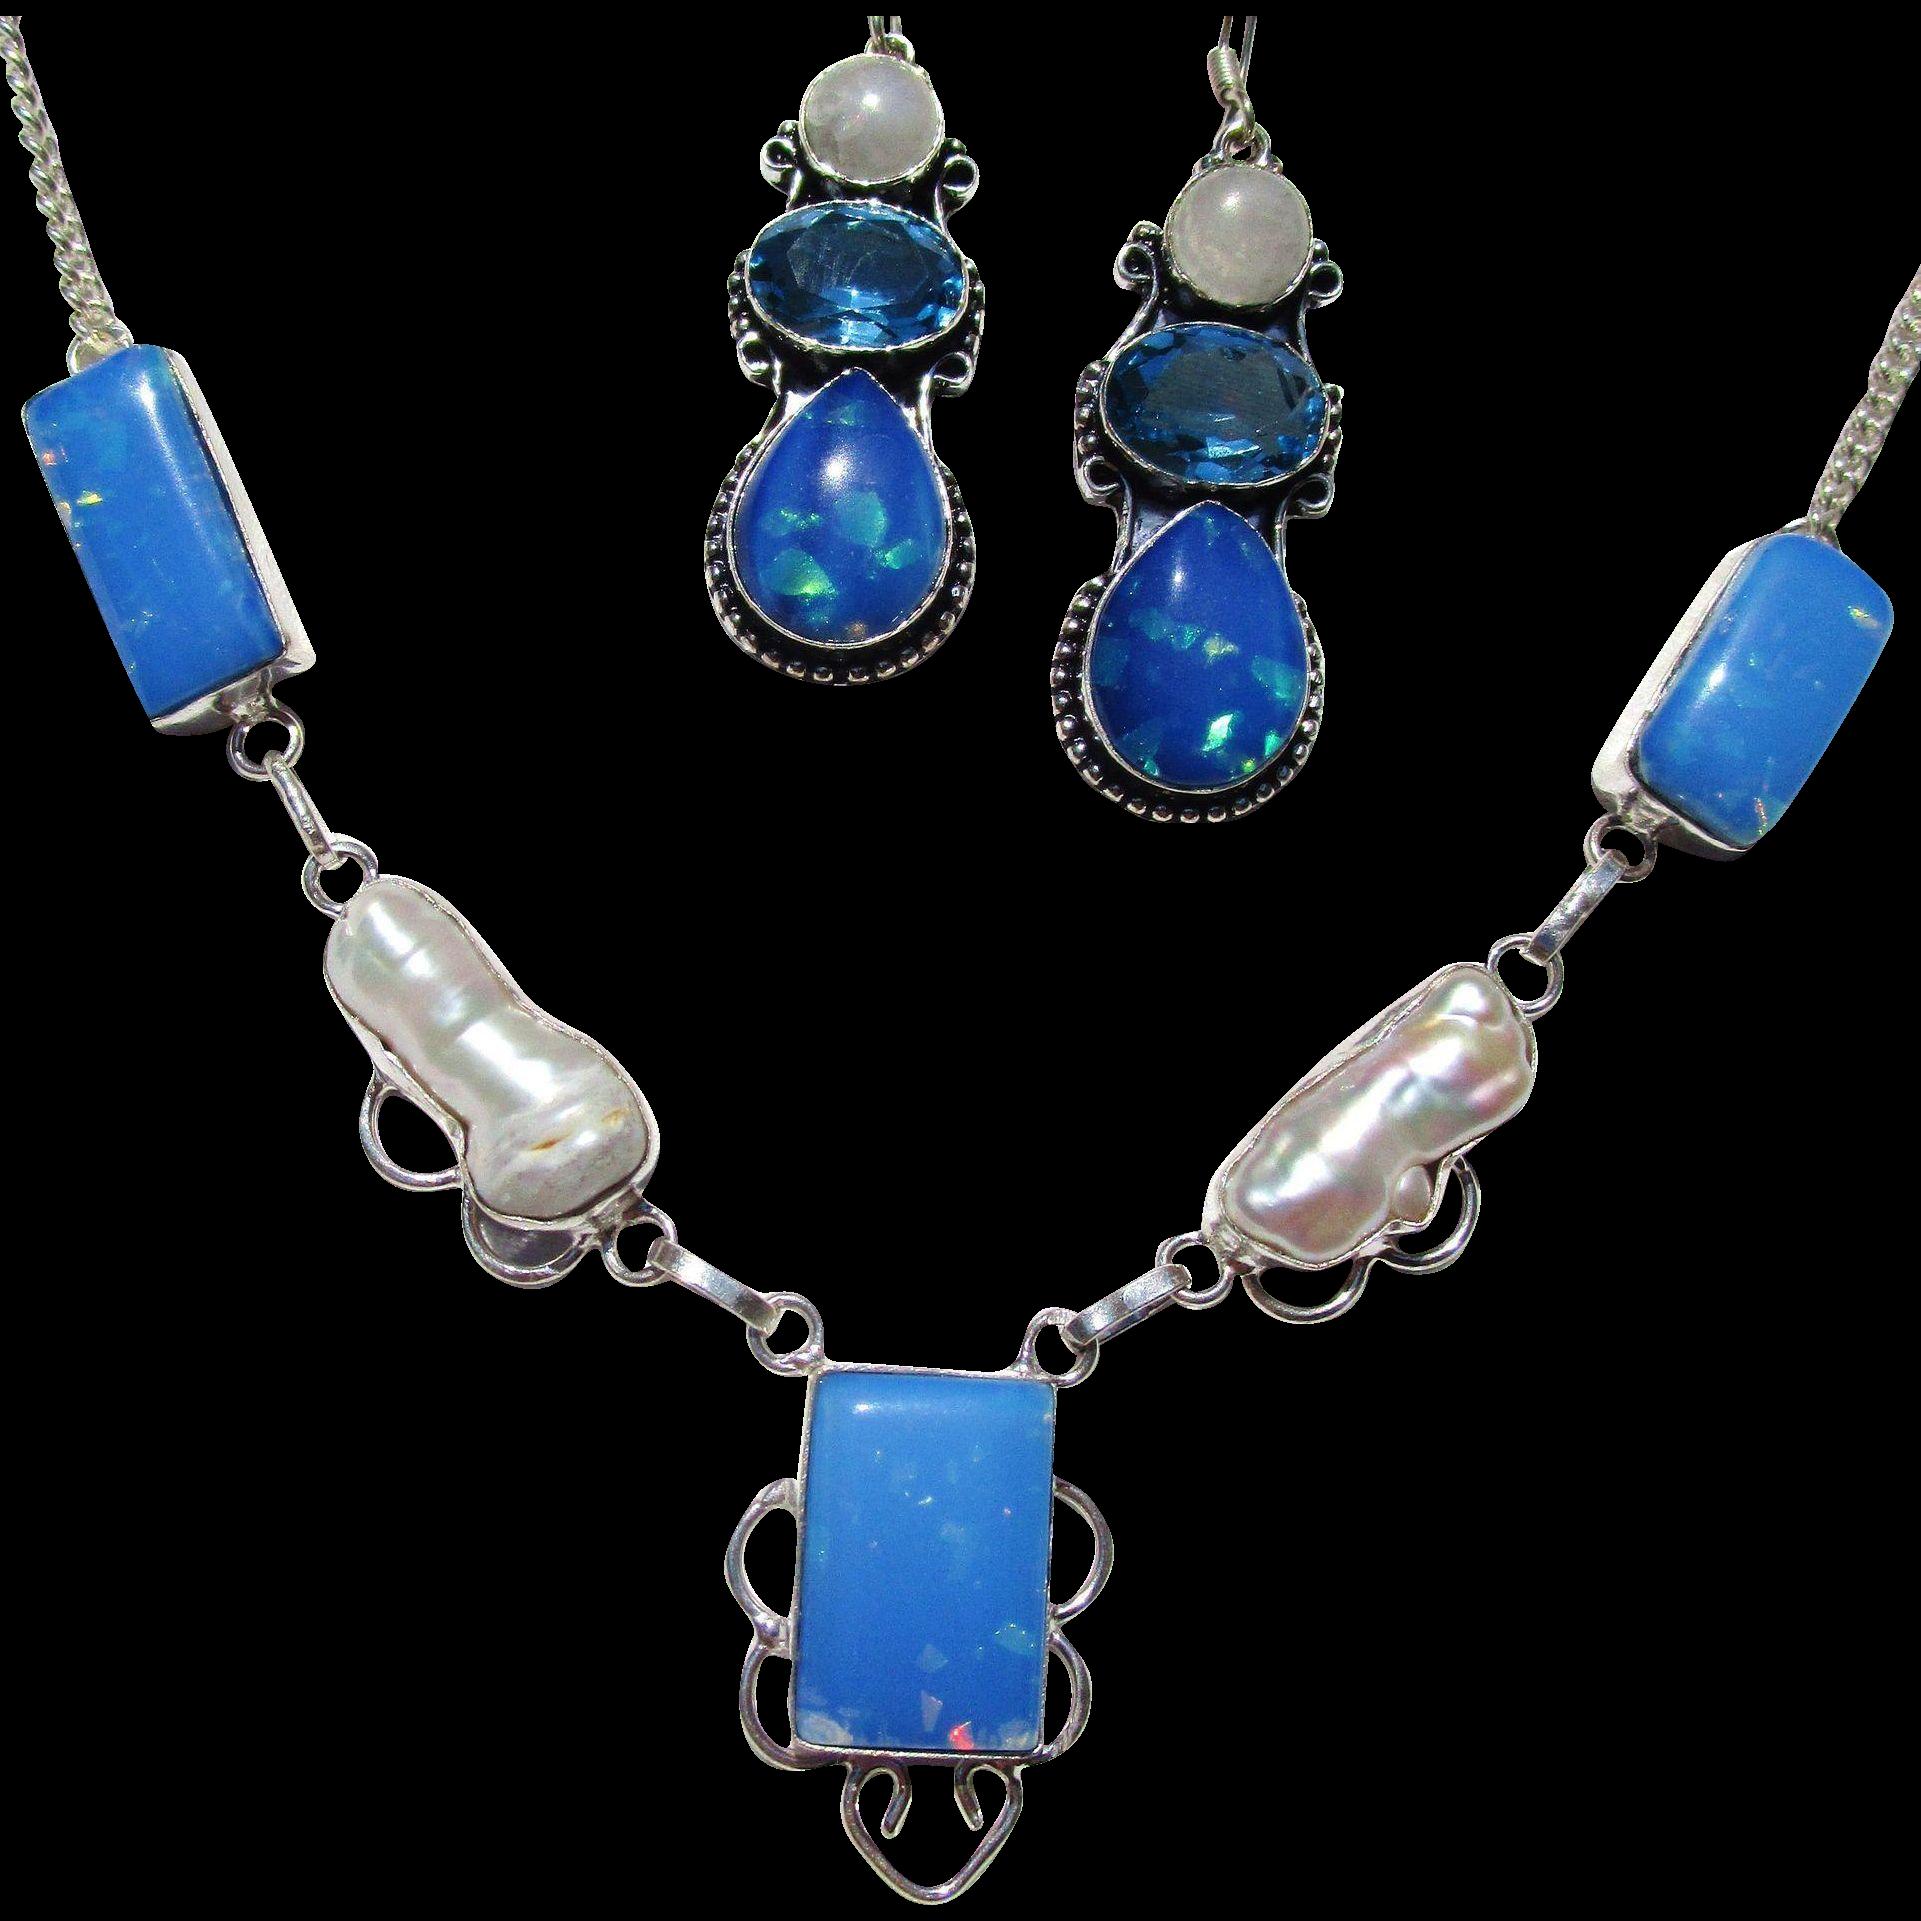 Dichroic Glass/Biwa Pearl Necklace/Earring Set